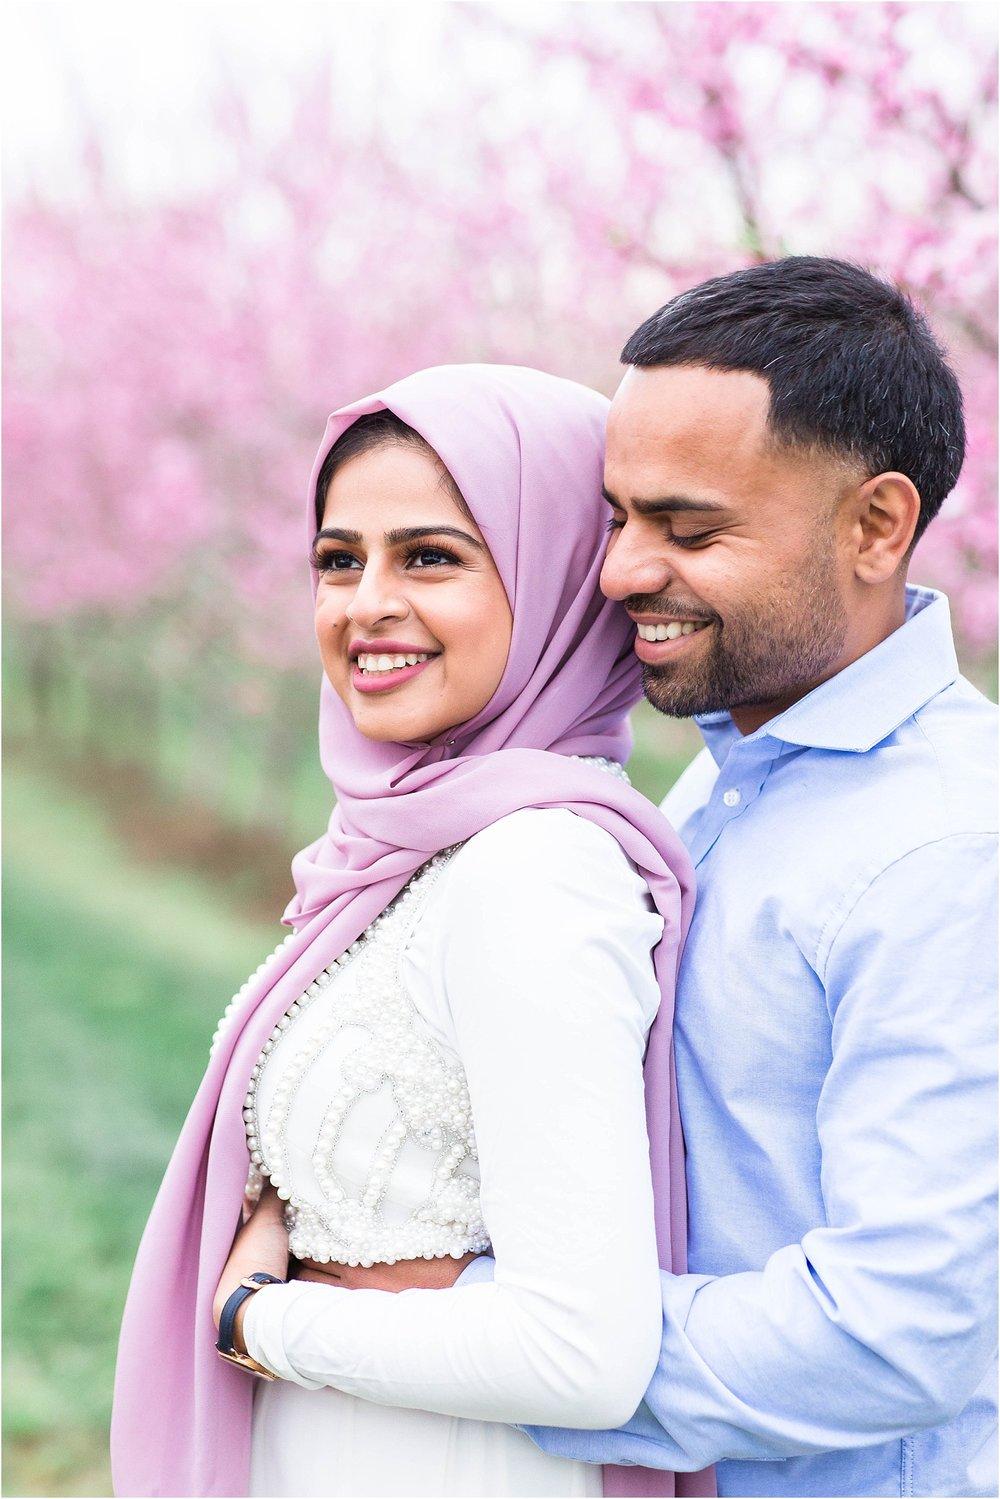 Niagara-on-the-lake-cherry-blossom-farm-Engagement-Session-Toronto-Mississauga-Brampton-Scarborough-GTA-Pakistani-Indian-Wedding-Engagement-Photographer-Photography_0024.jpg